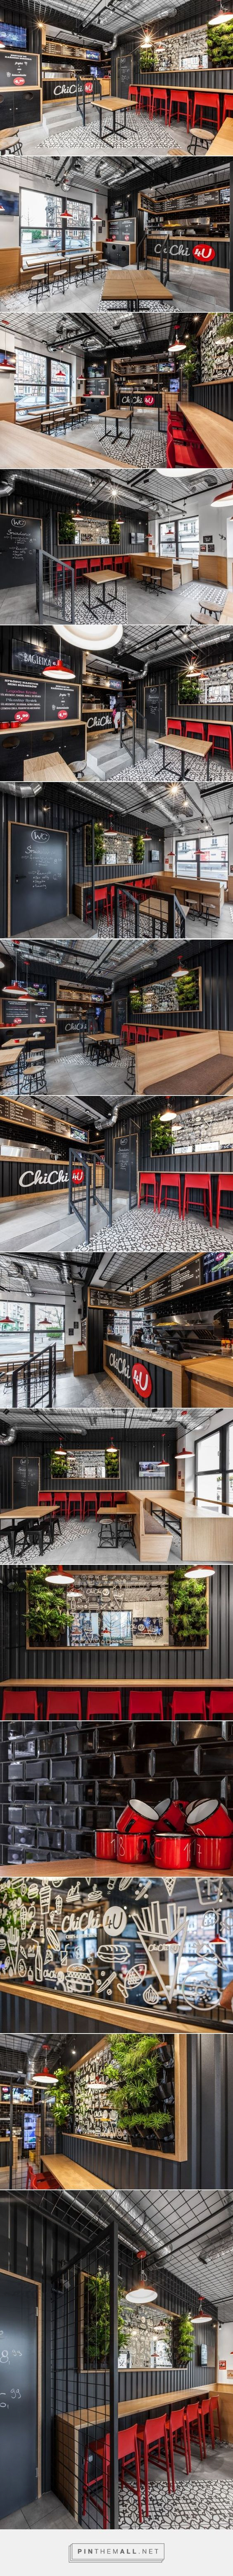 ChiChi 4U Burger Bar ... https://pinthemall.net/pin/56f6a0062ea1d/?creation=1